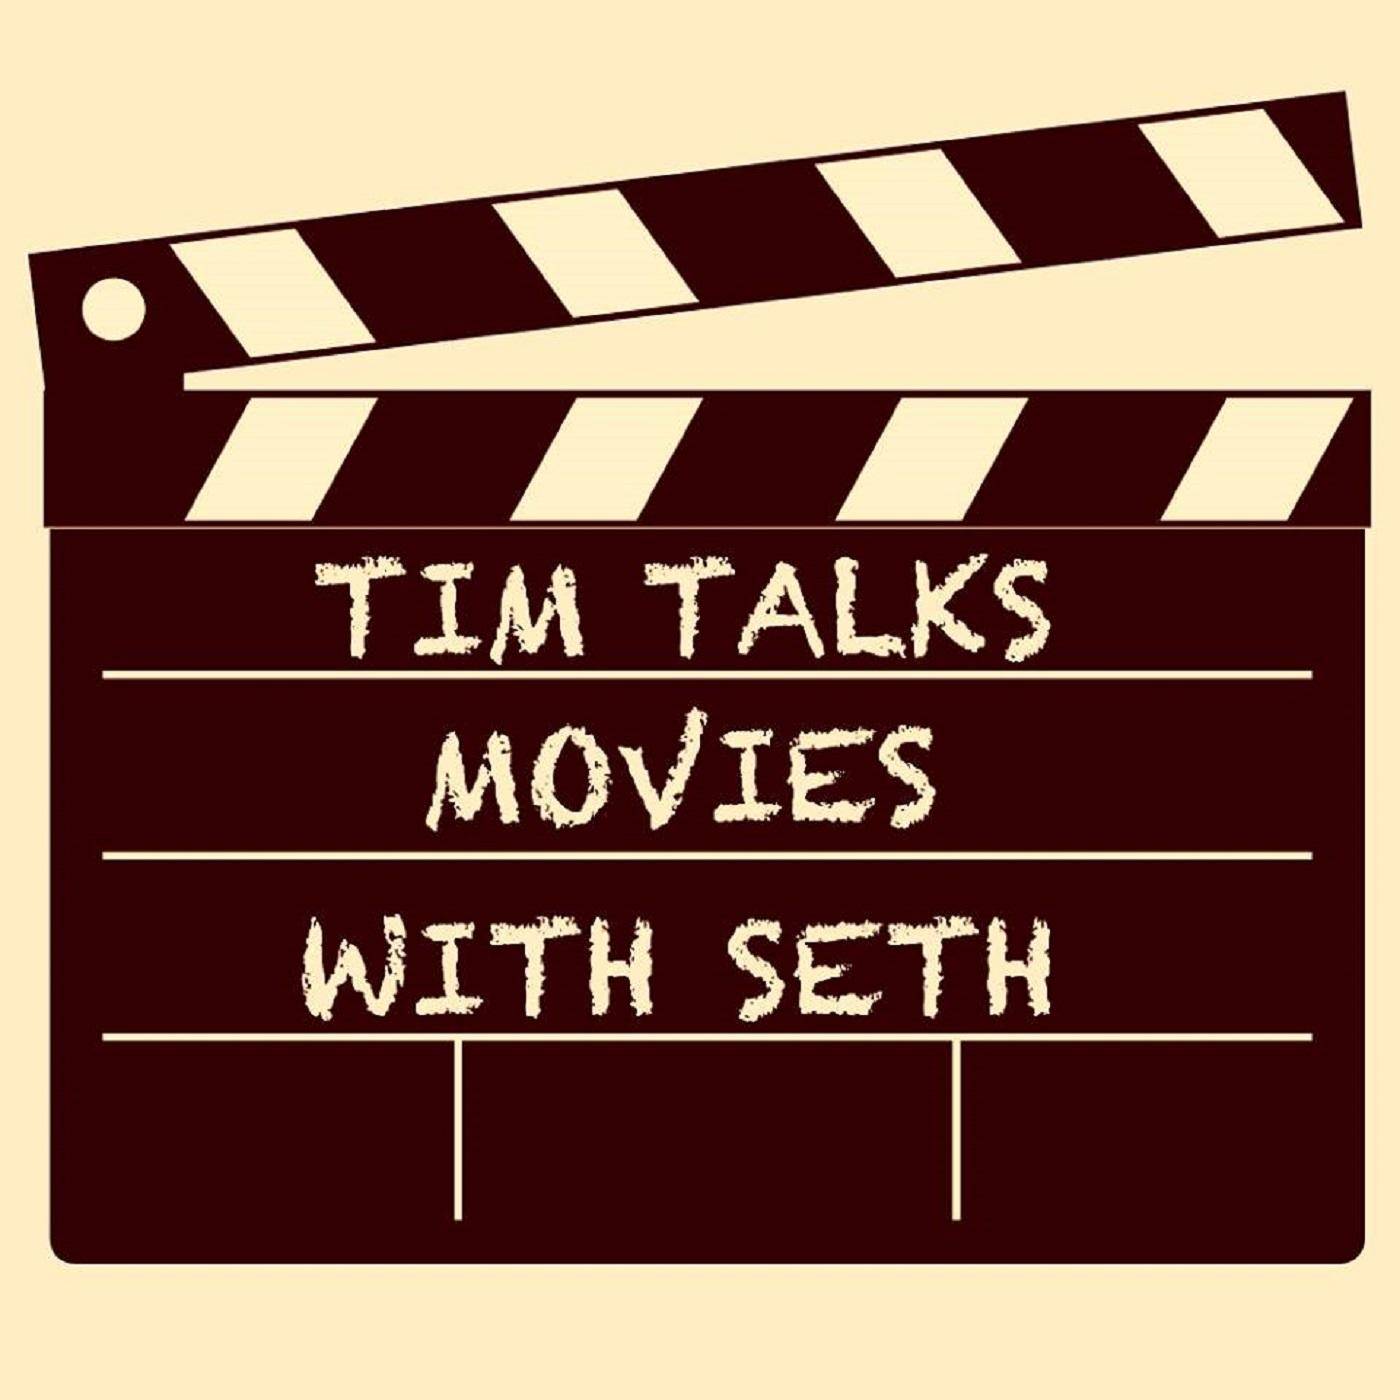 Tim Talks Movies with Seth show art